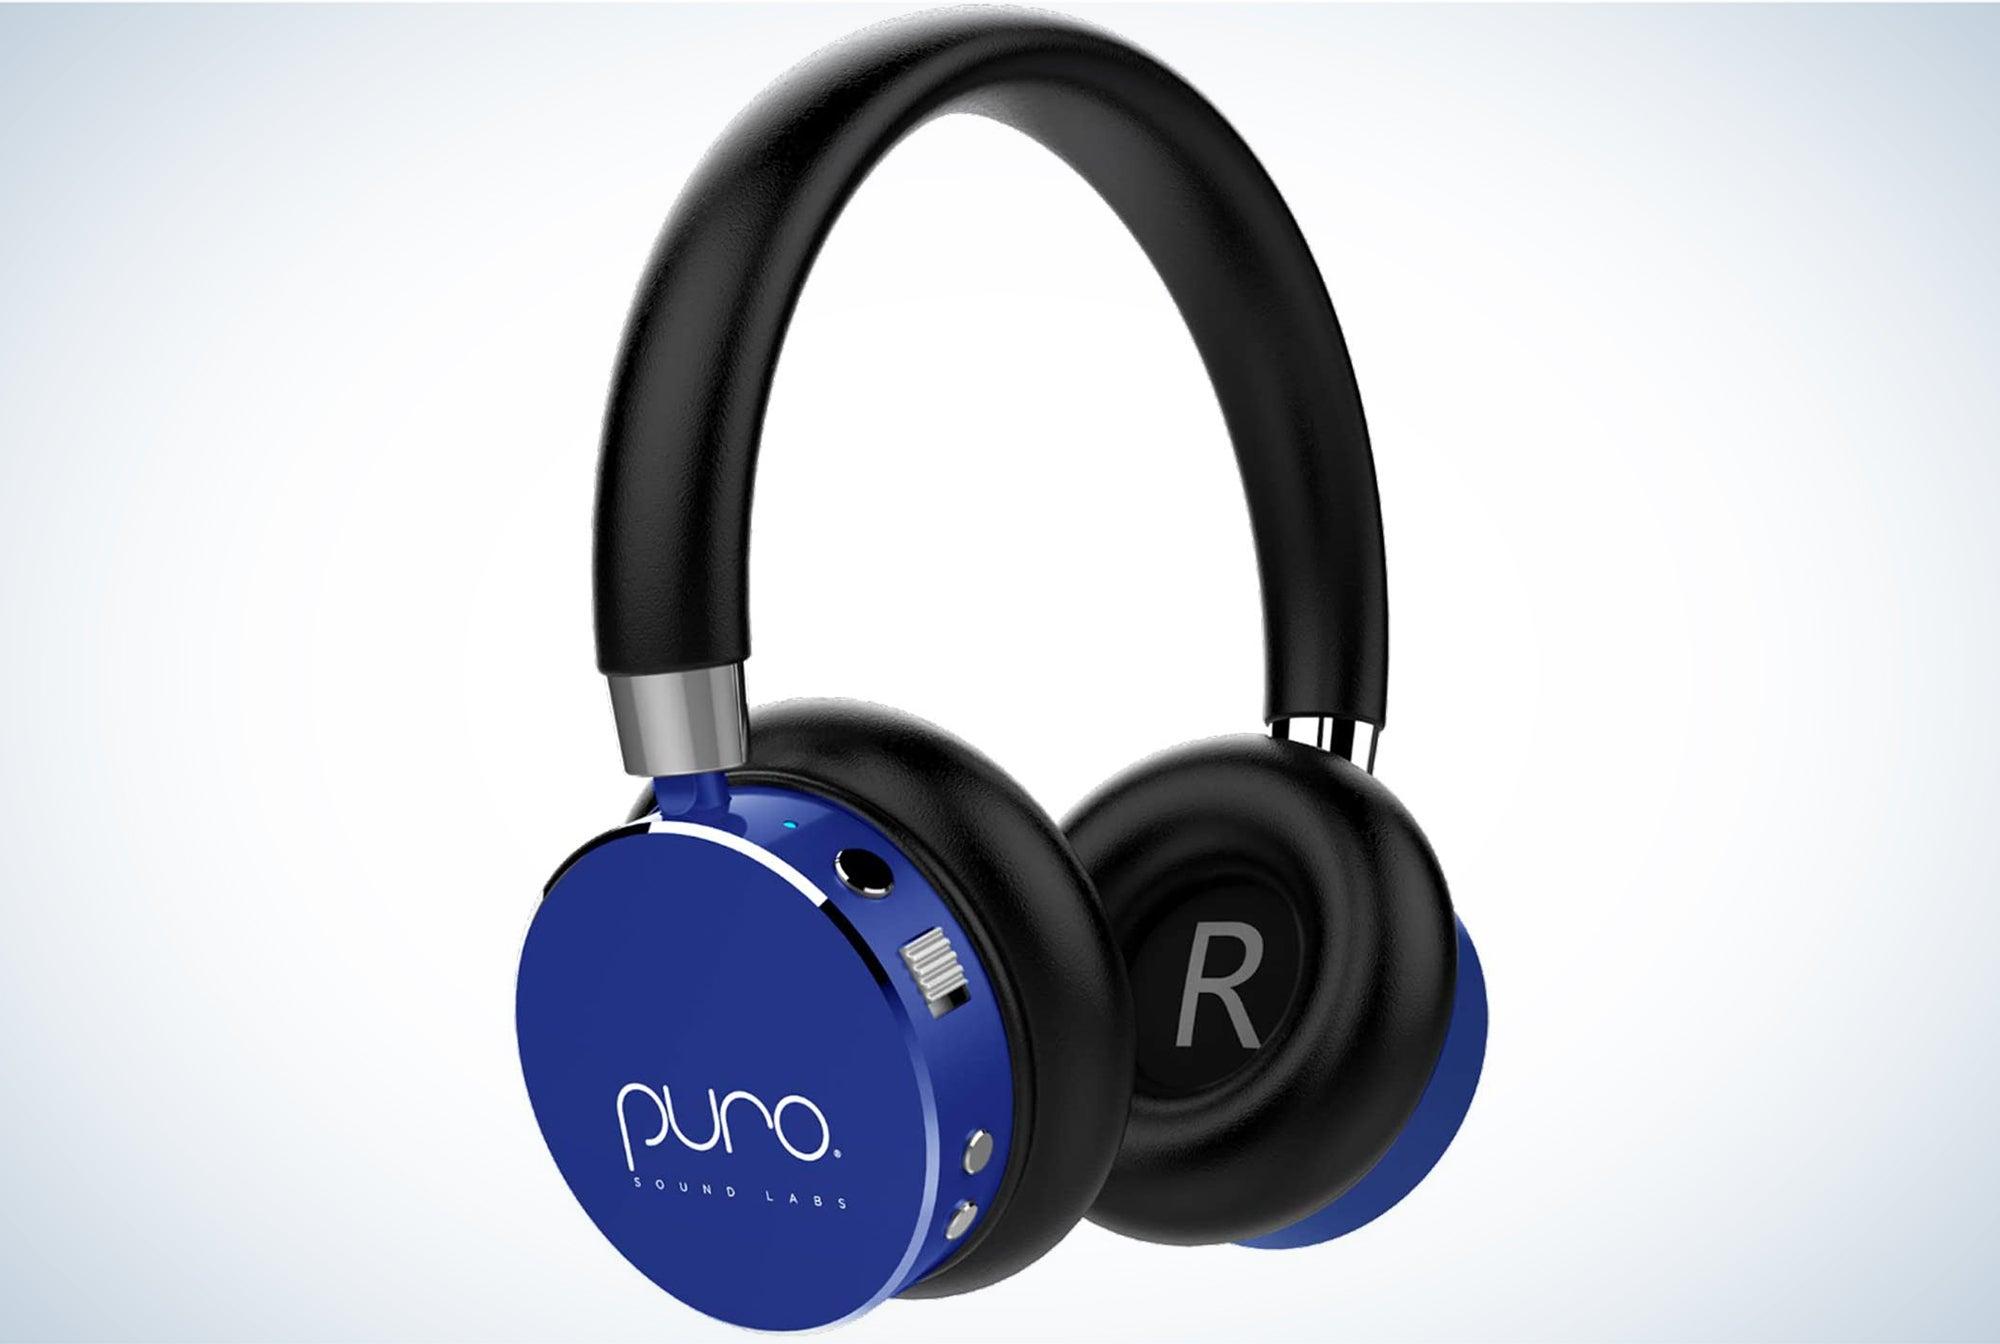 Puro BT2200 are the best kids' headphones.